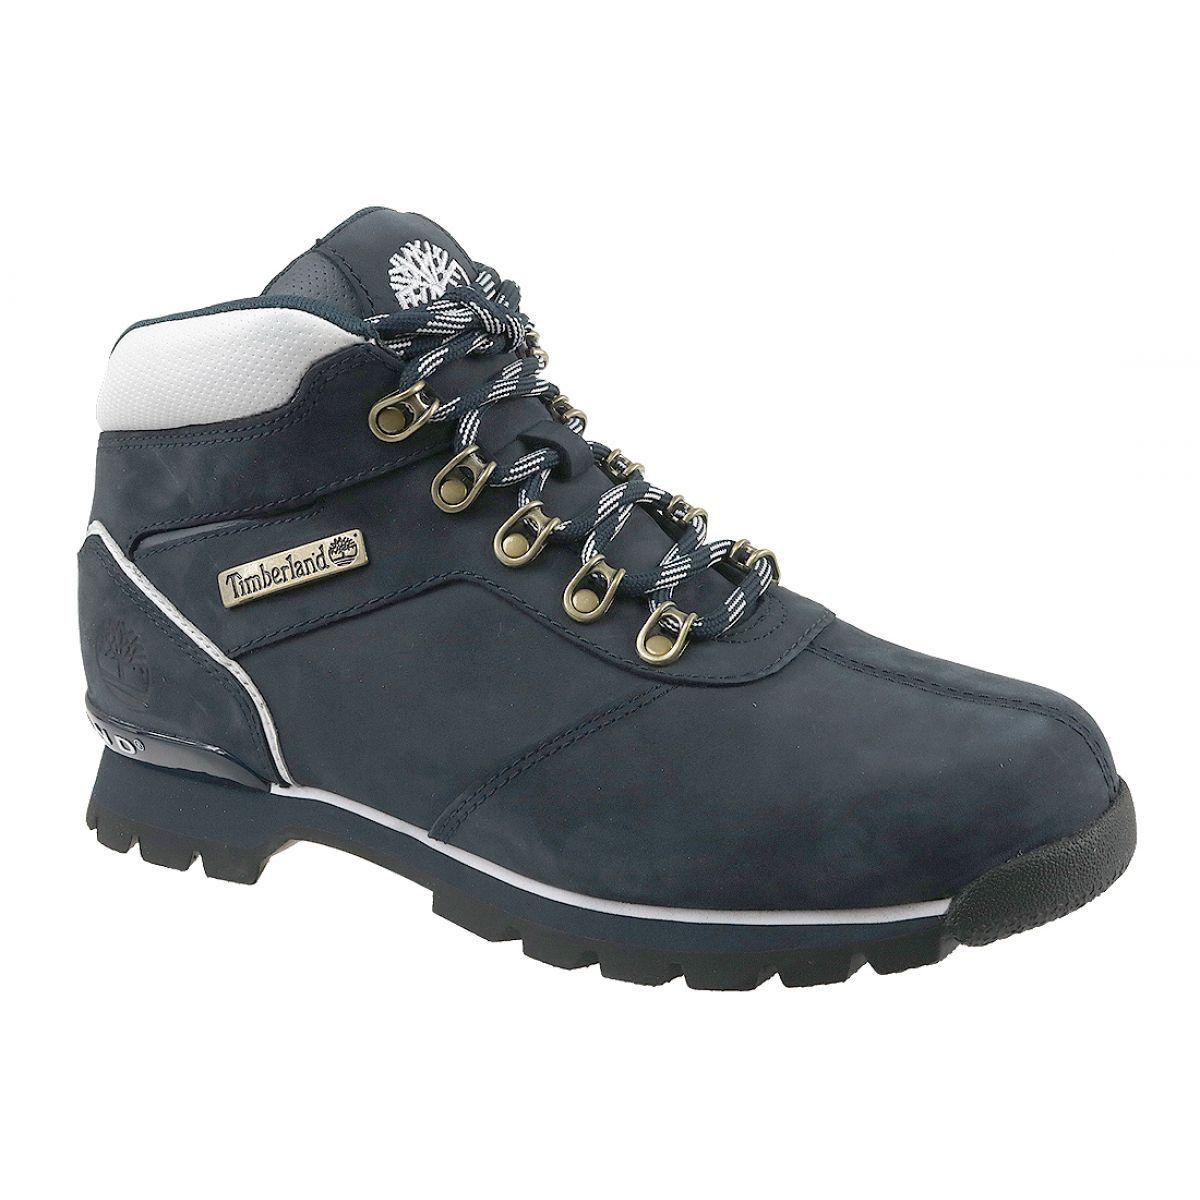 Buty Zimowe Timberland Split Rock 2 M 6569r Granatowe Winter Boots Mens Shoes Uk Boots